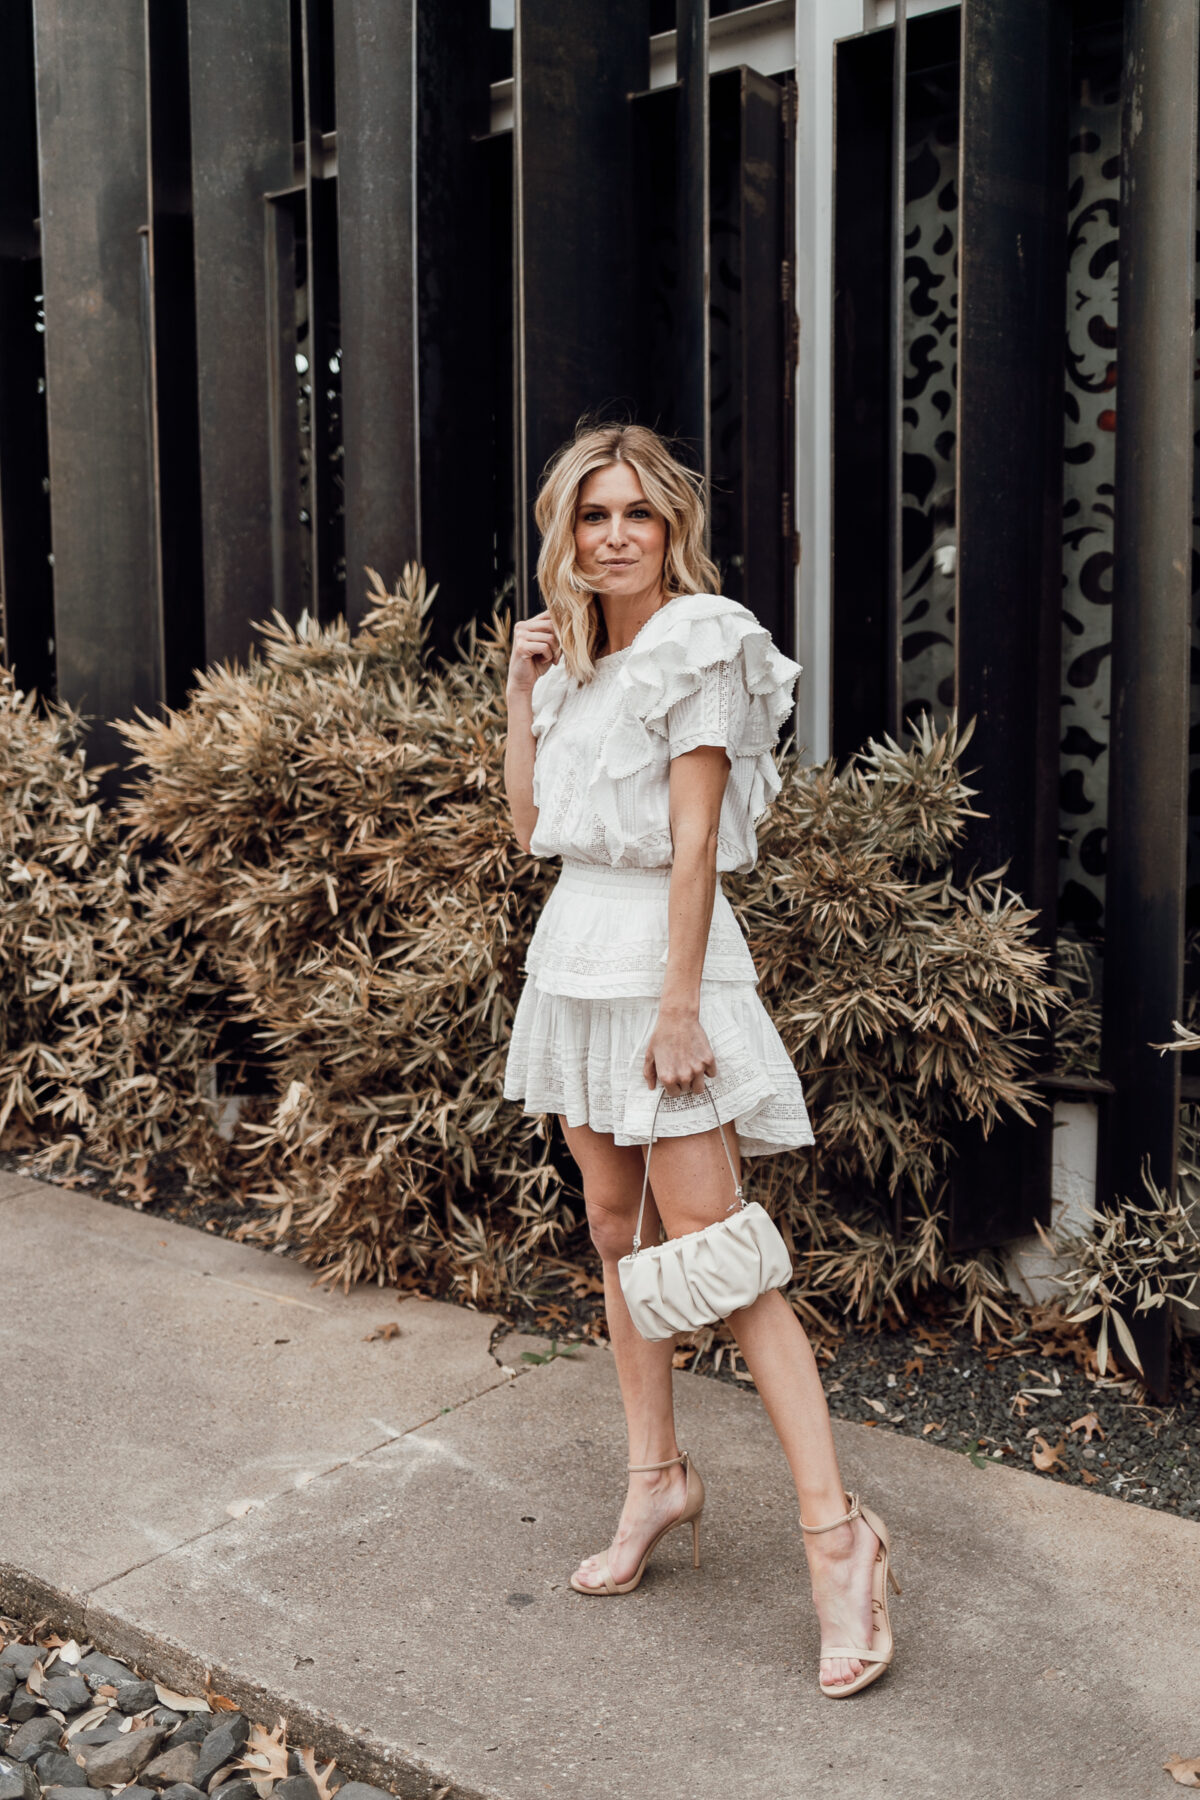 white dress outfit idea